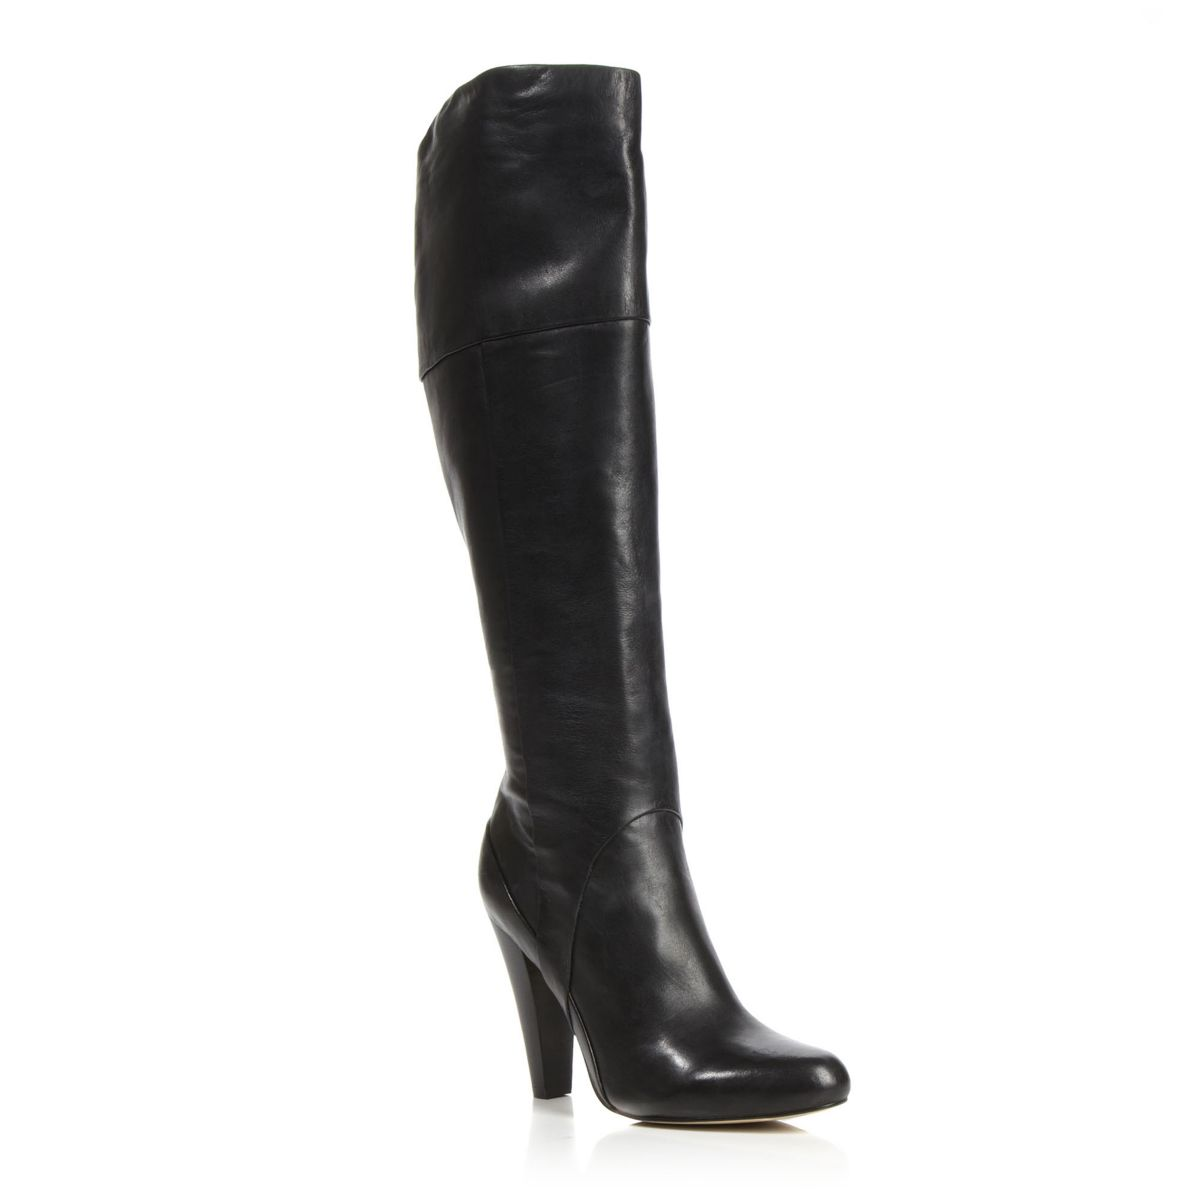 dune sevenoaks womens black leather zip knee high